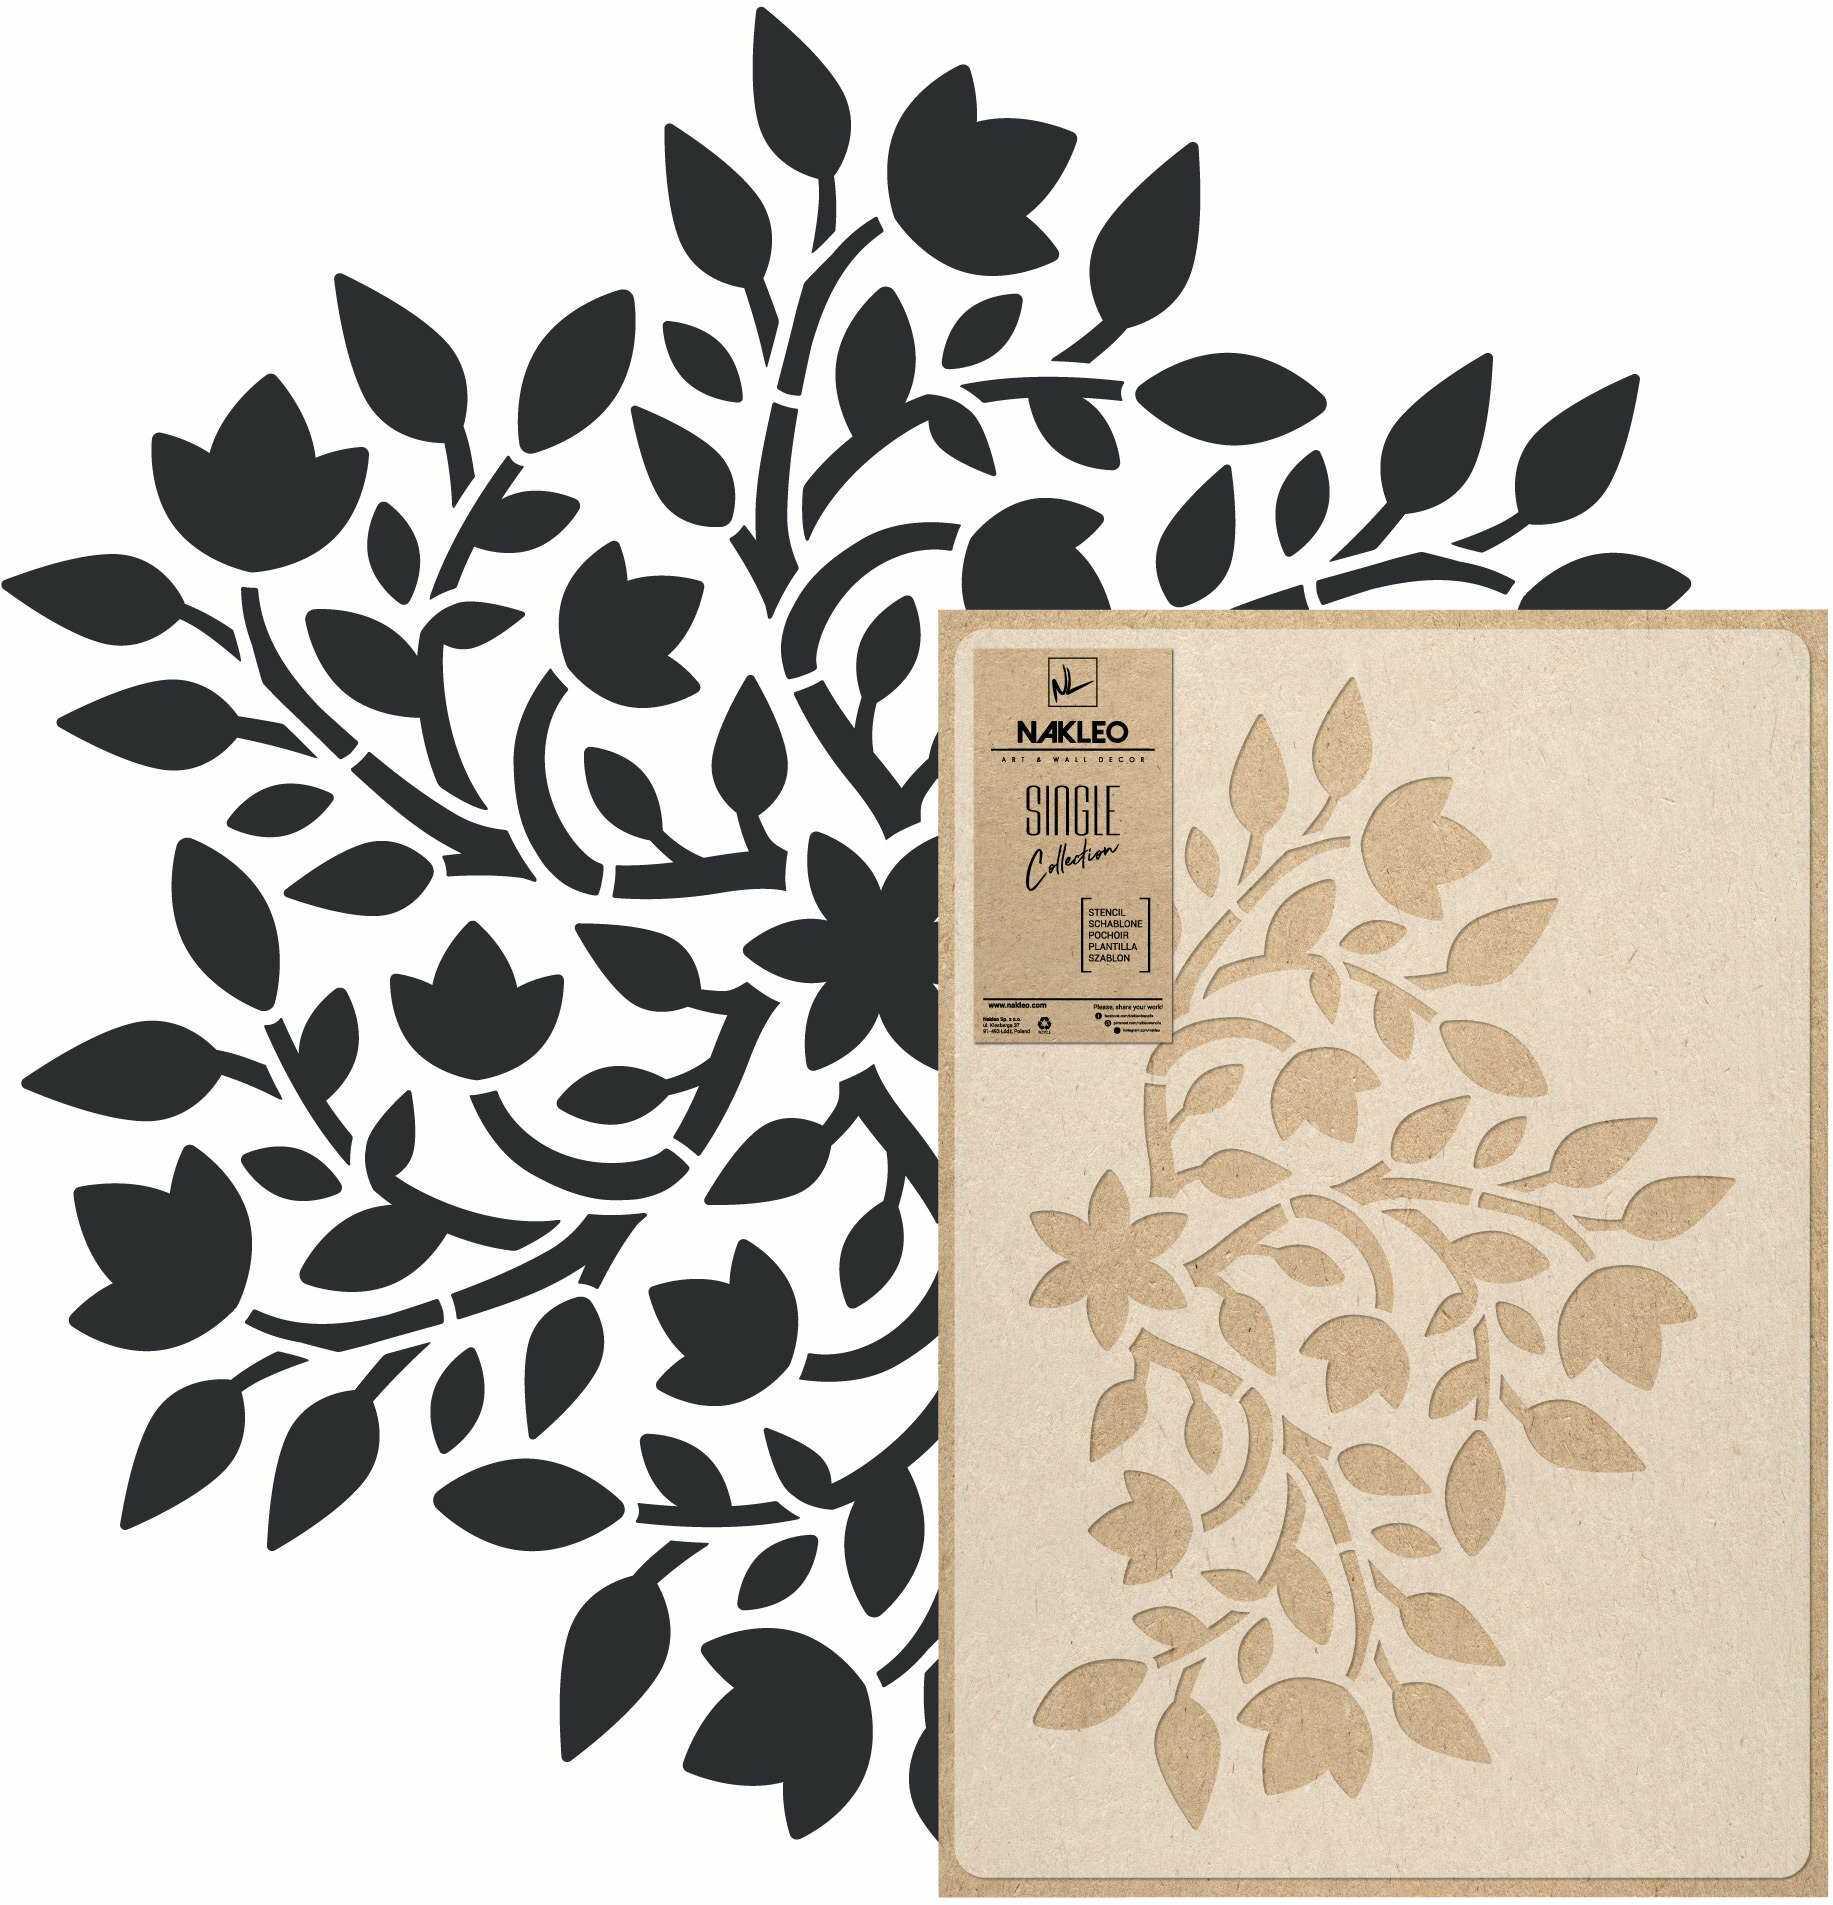 szablon malarski wielokrotny // MANDALA #02 - LARGE (65x95cm)